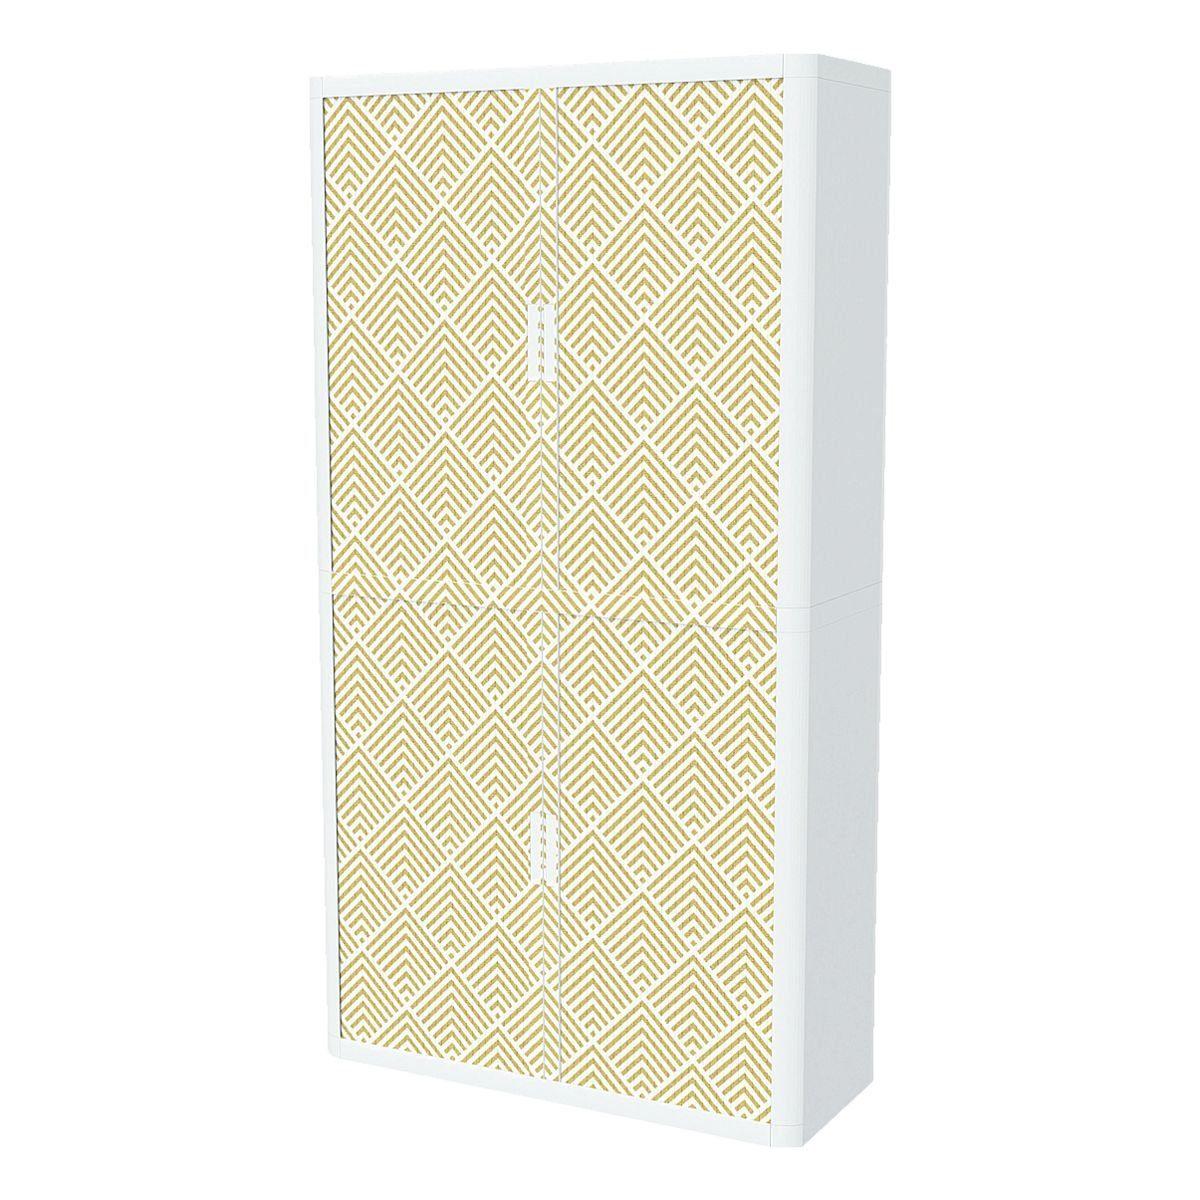 EASYOFFICE Rollladenschrank 110 x 204 cm »easyOffice«